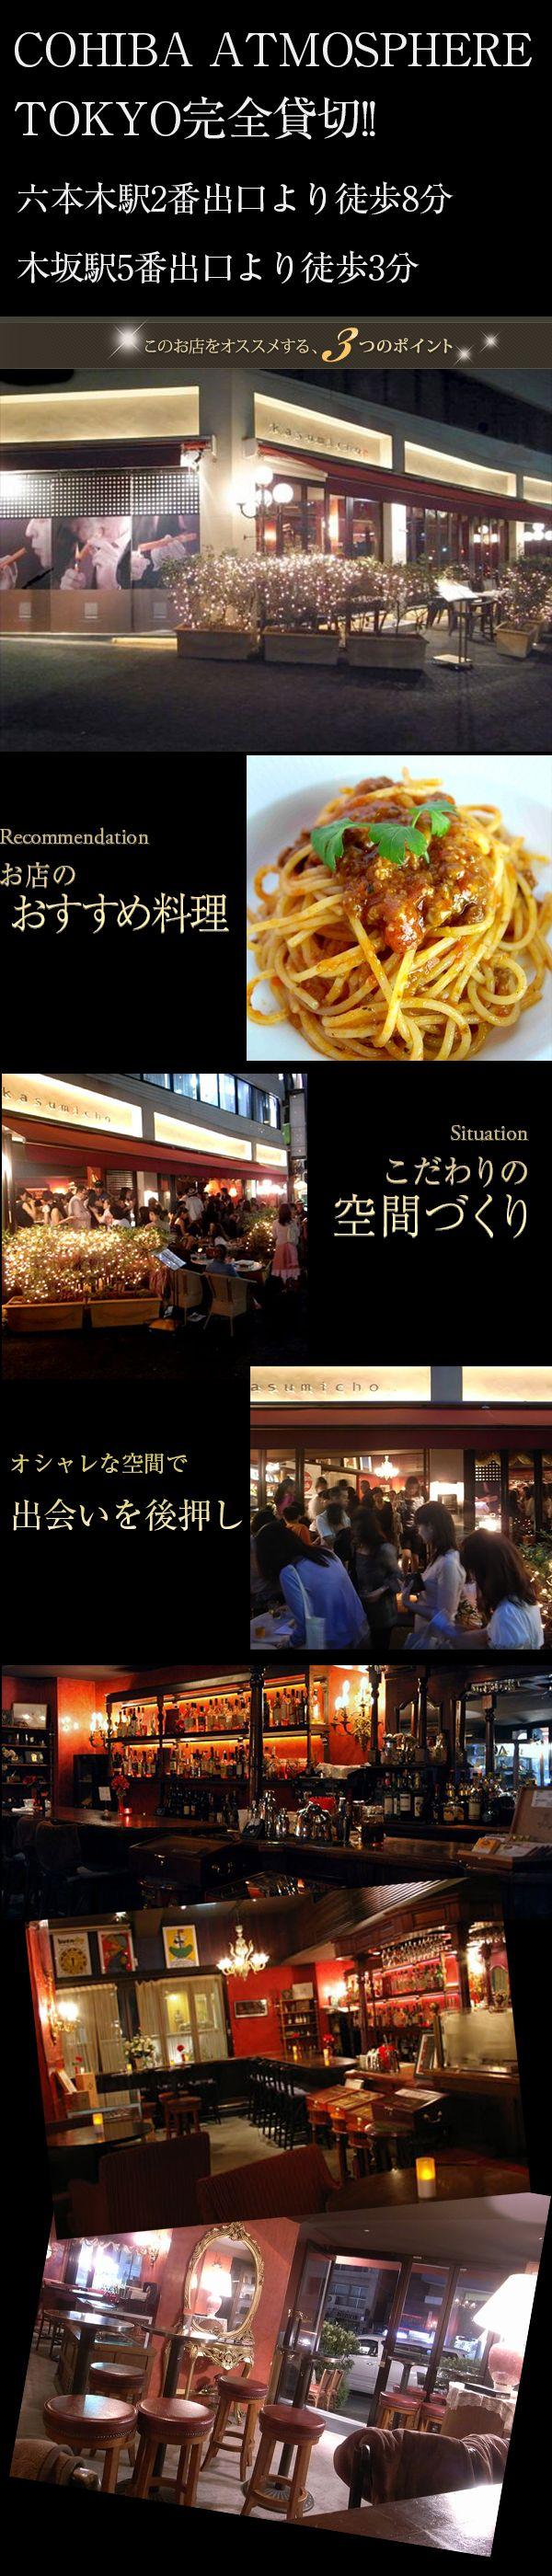 COHIBA ATMOSPHERE TOKYO